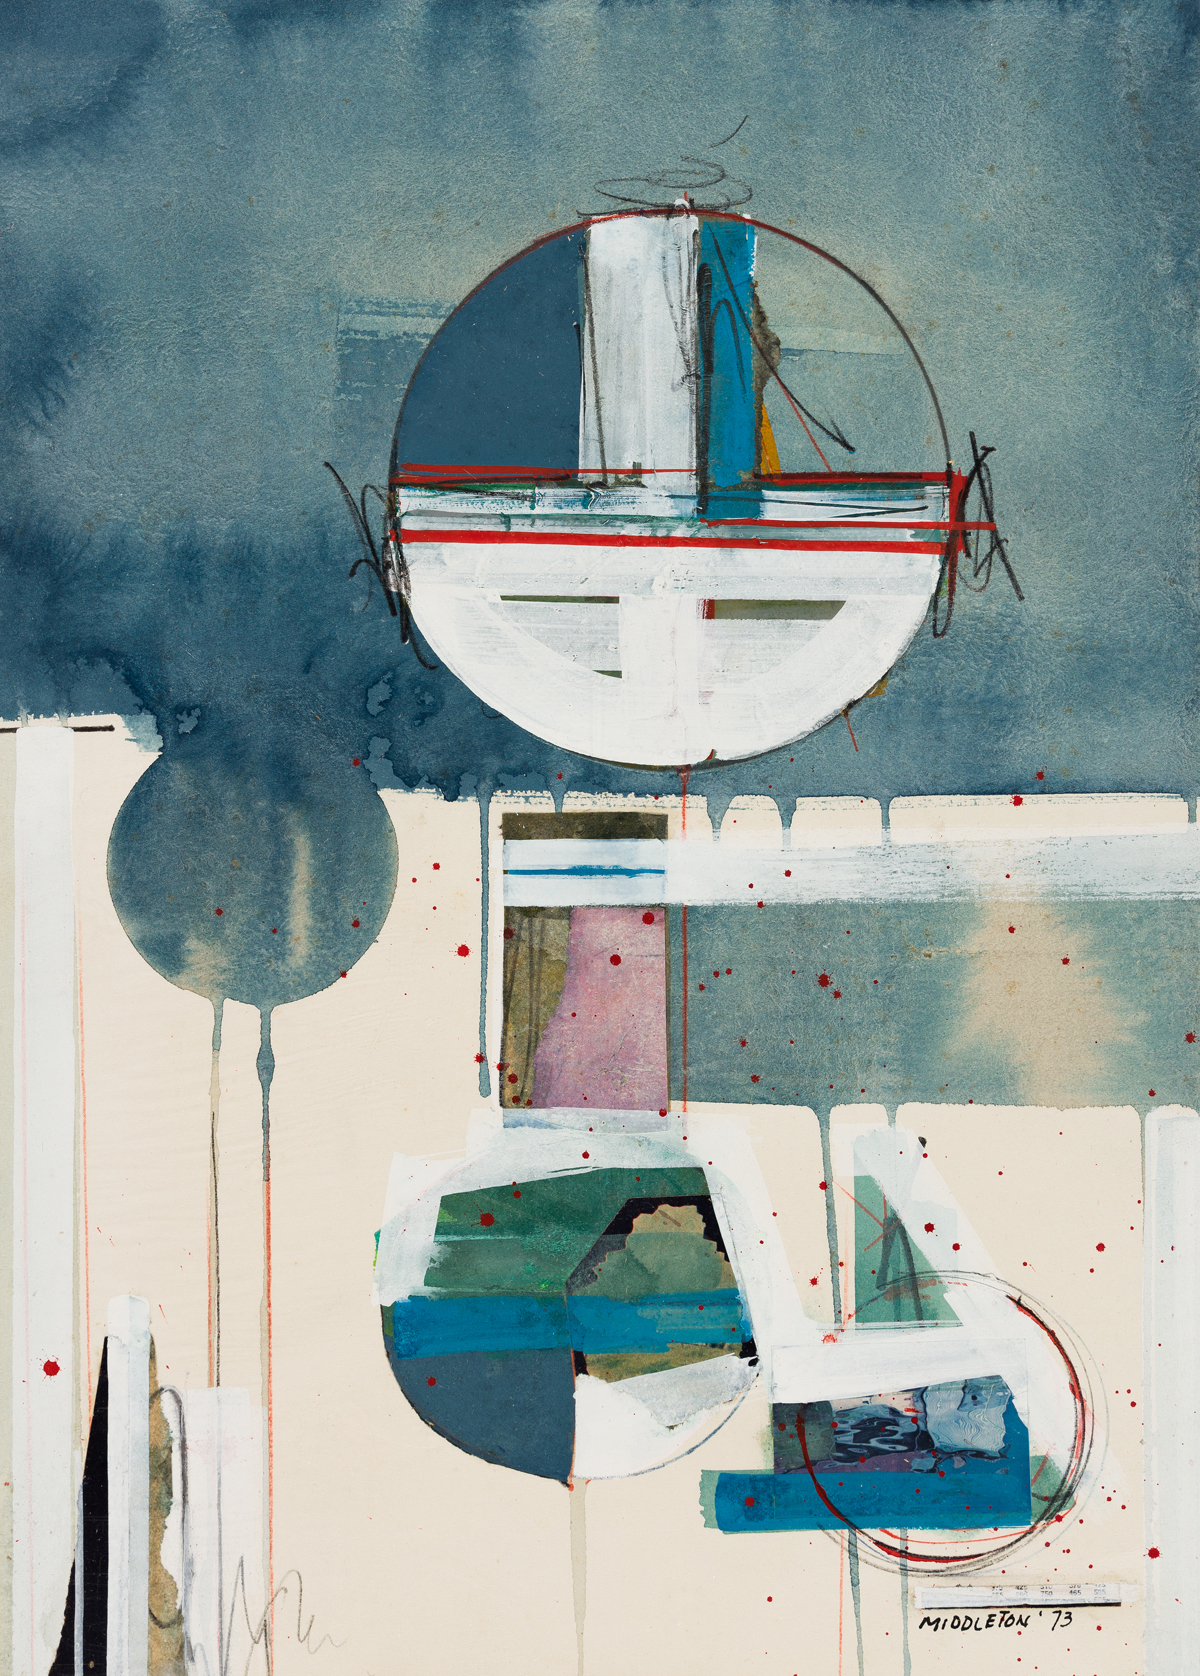 SAM MIDDLETON (1927 - 2015, AMERICAN) Untitled.